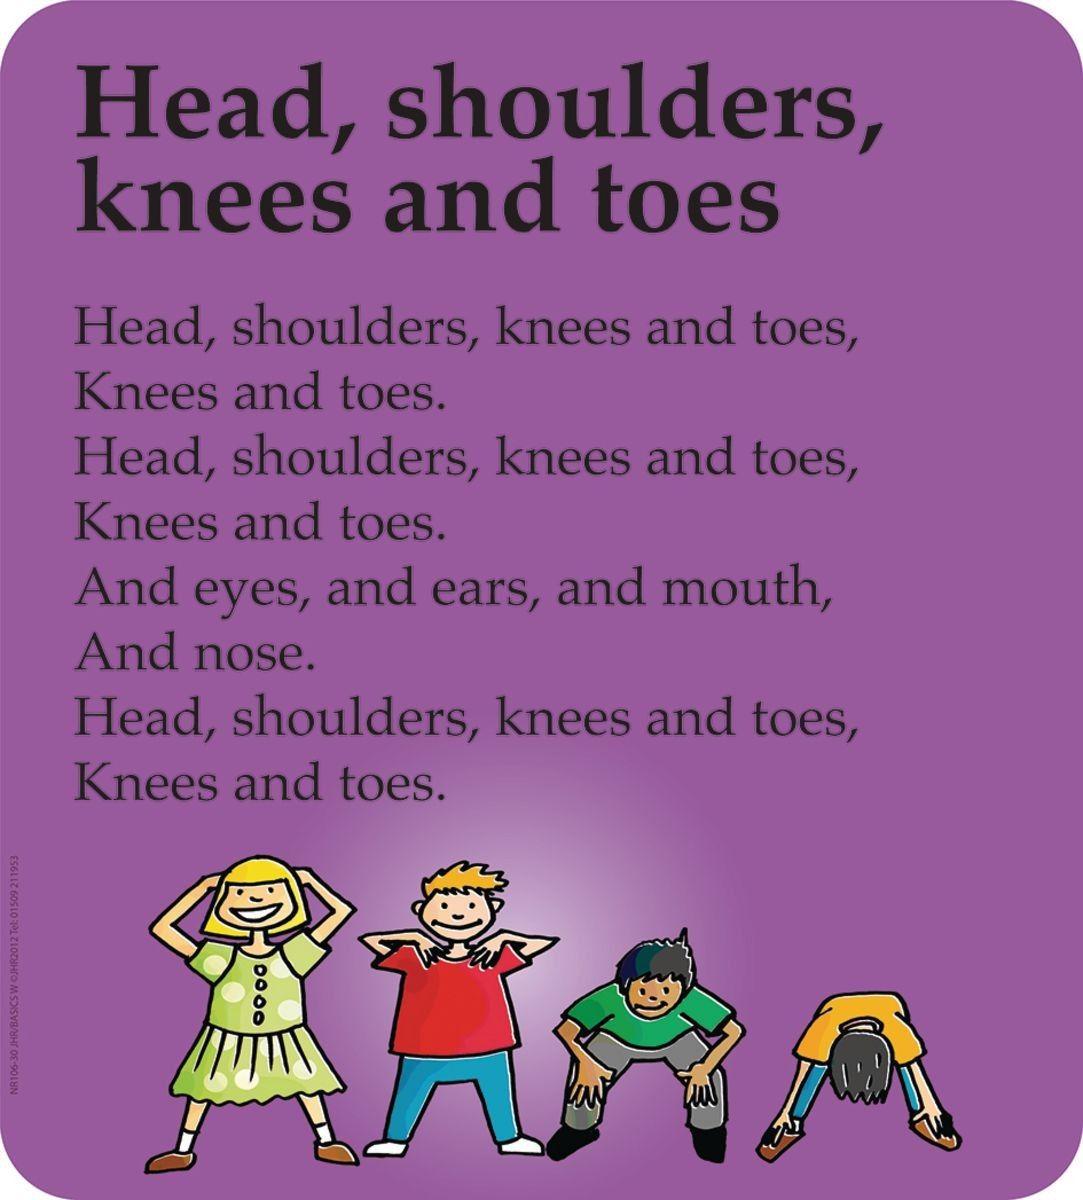 Traditional Nursery Rhyme Signs